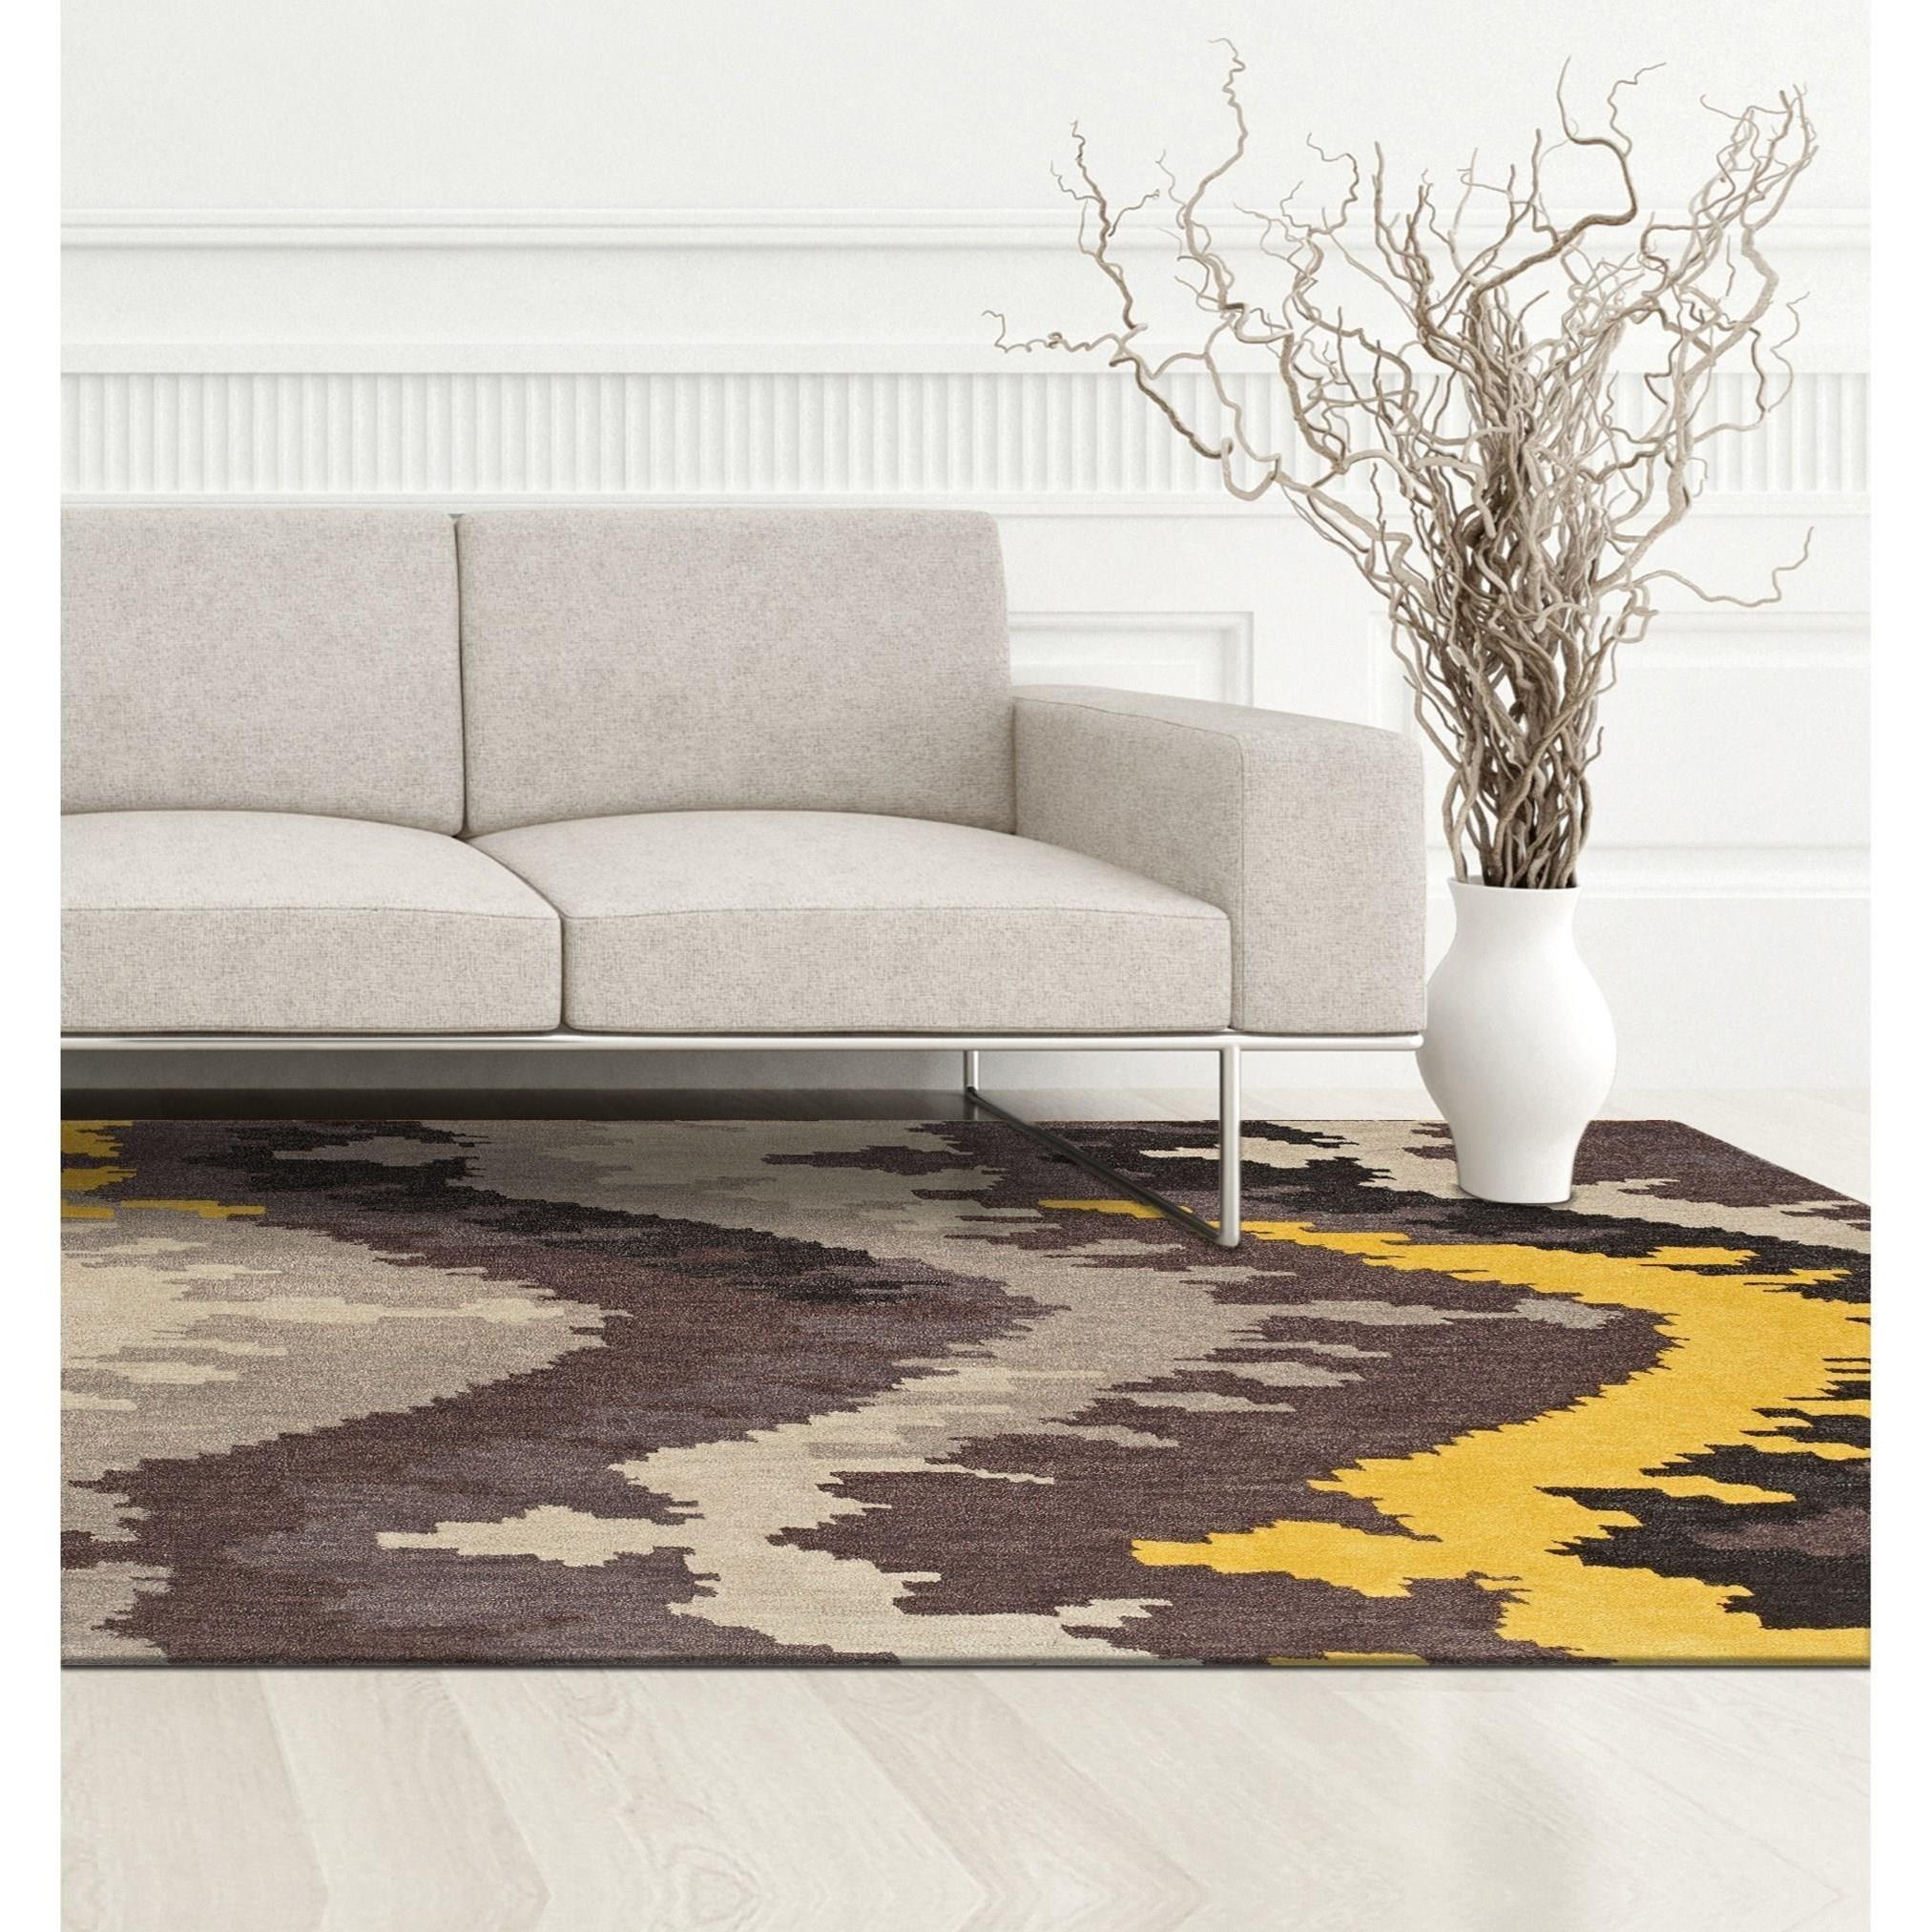 Dalyn Impulse Grey 9u0026#39;X13u0026#39; Rug - Darvin Furniture - Rug